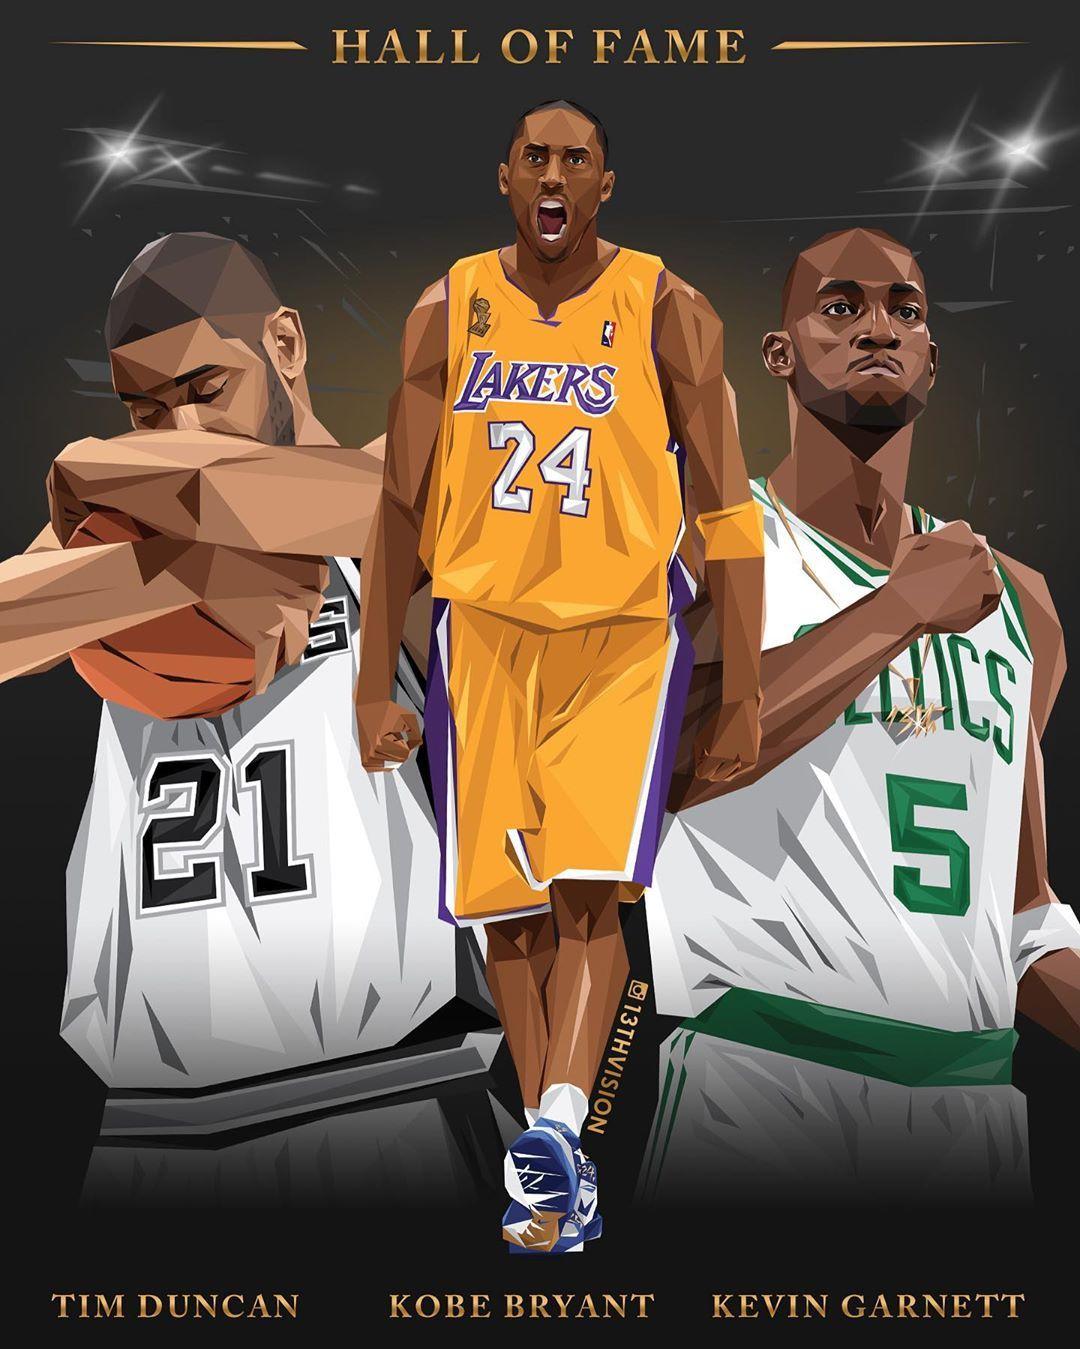 Pin By Elijah Camacho On Basketball Legends In 2020 Nba Legends Kobe Bryant Kevin Garnett